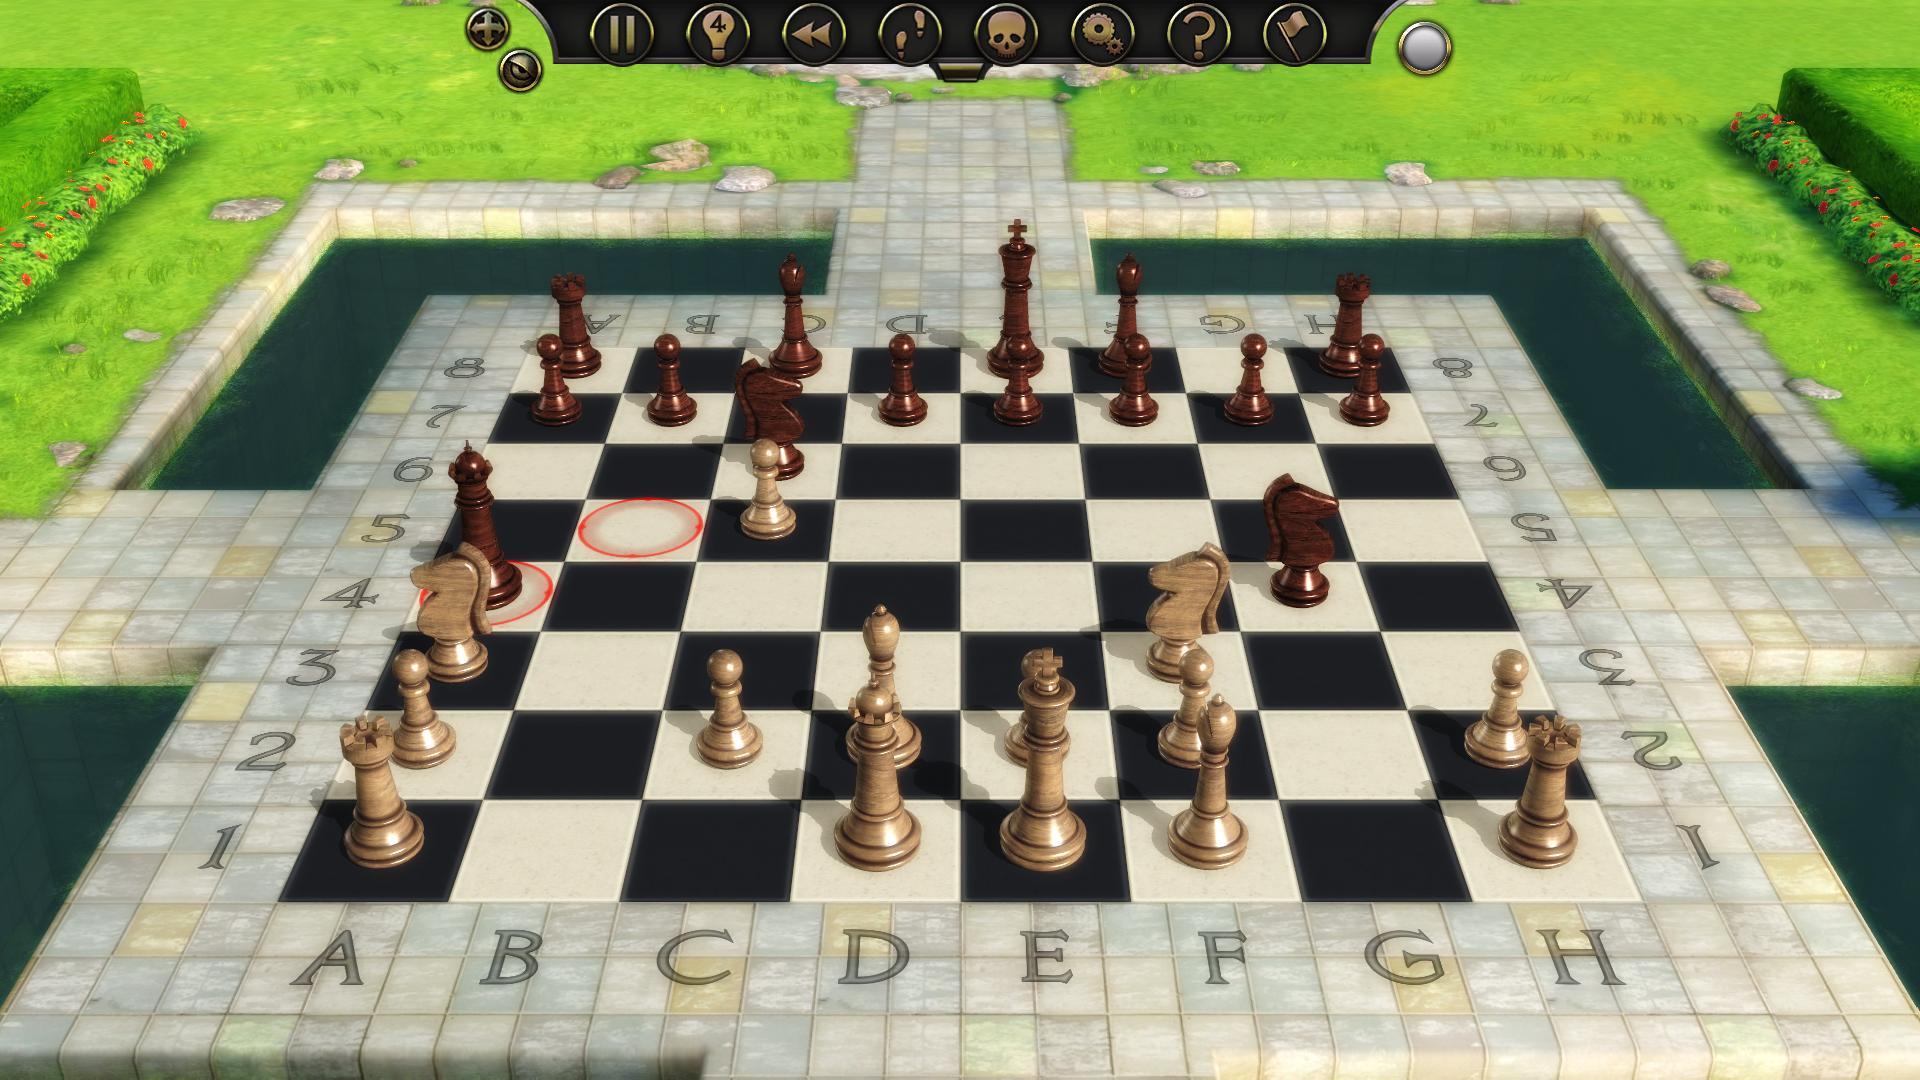 battle chess windows 7